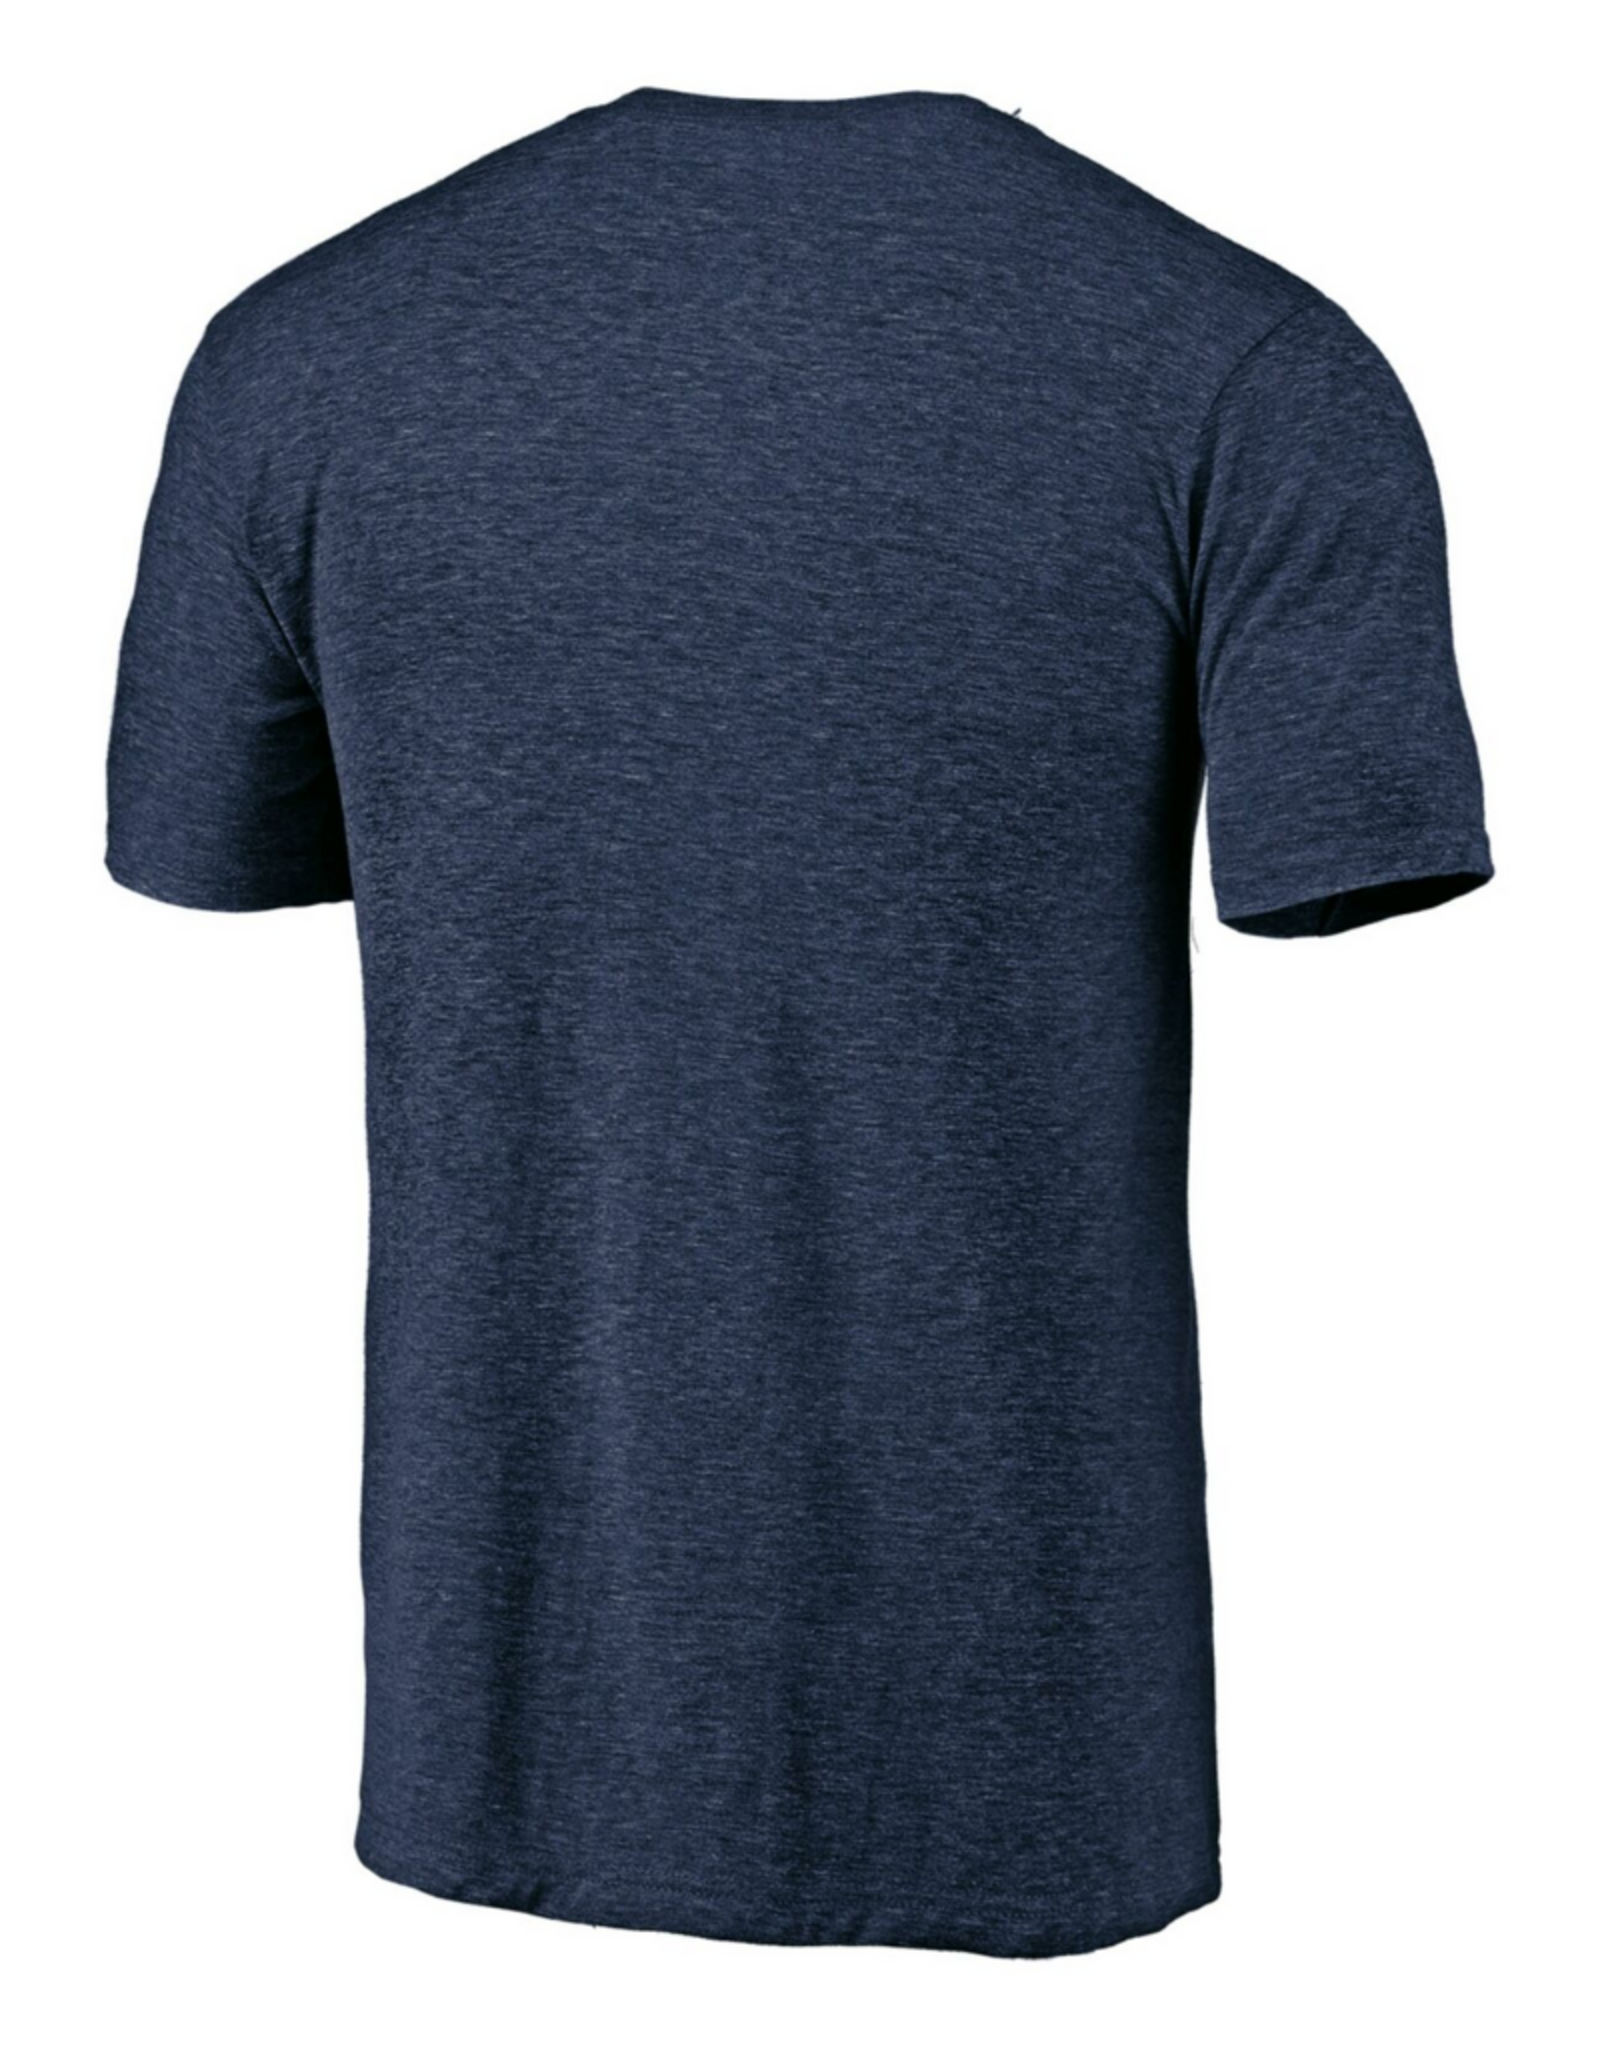 Fanatics Fanatics Distressed Team Tri-Blend T-Shirt Seattle Kraken Navy